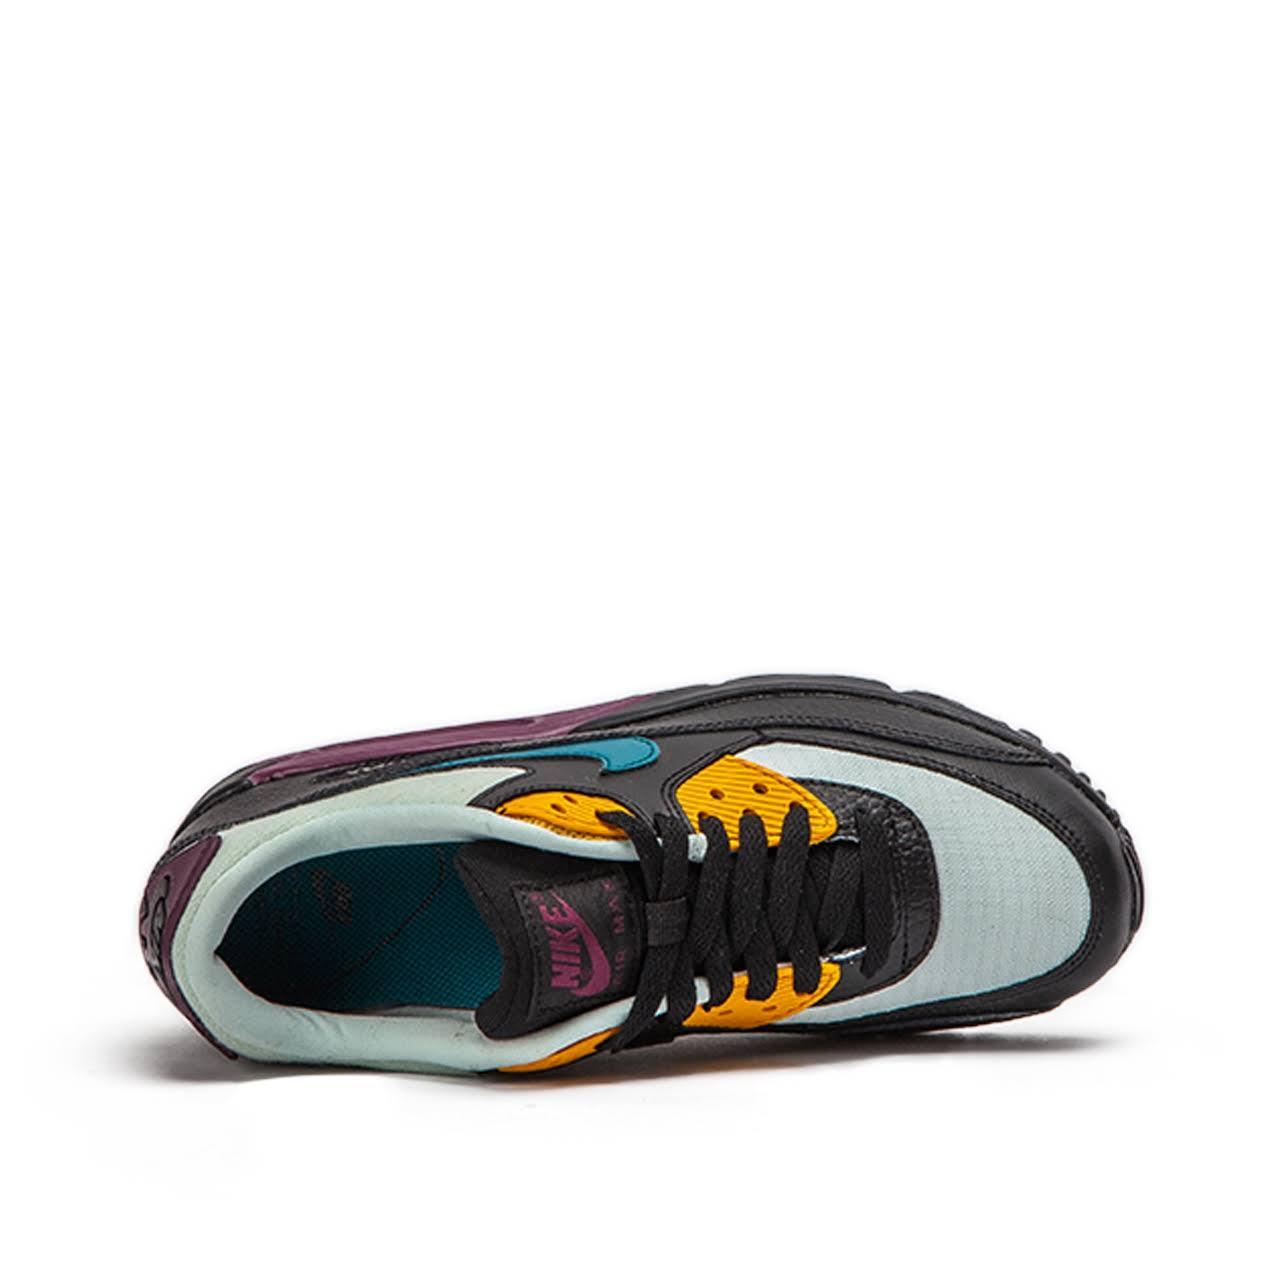 Max Damenschuhe 90 Größe Air 325213058 Nike 5 9 PqBwR5q4x